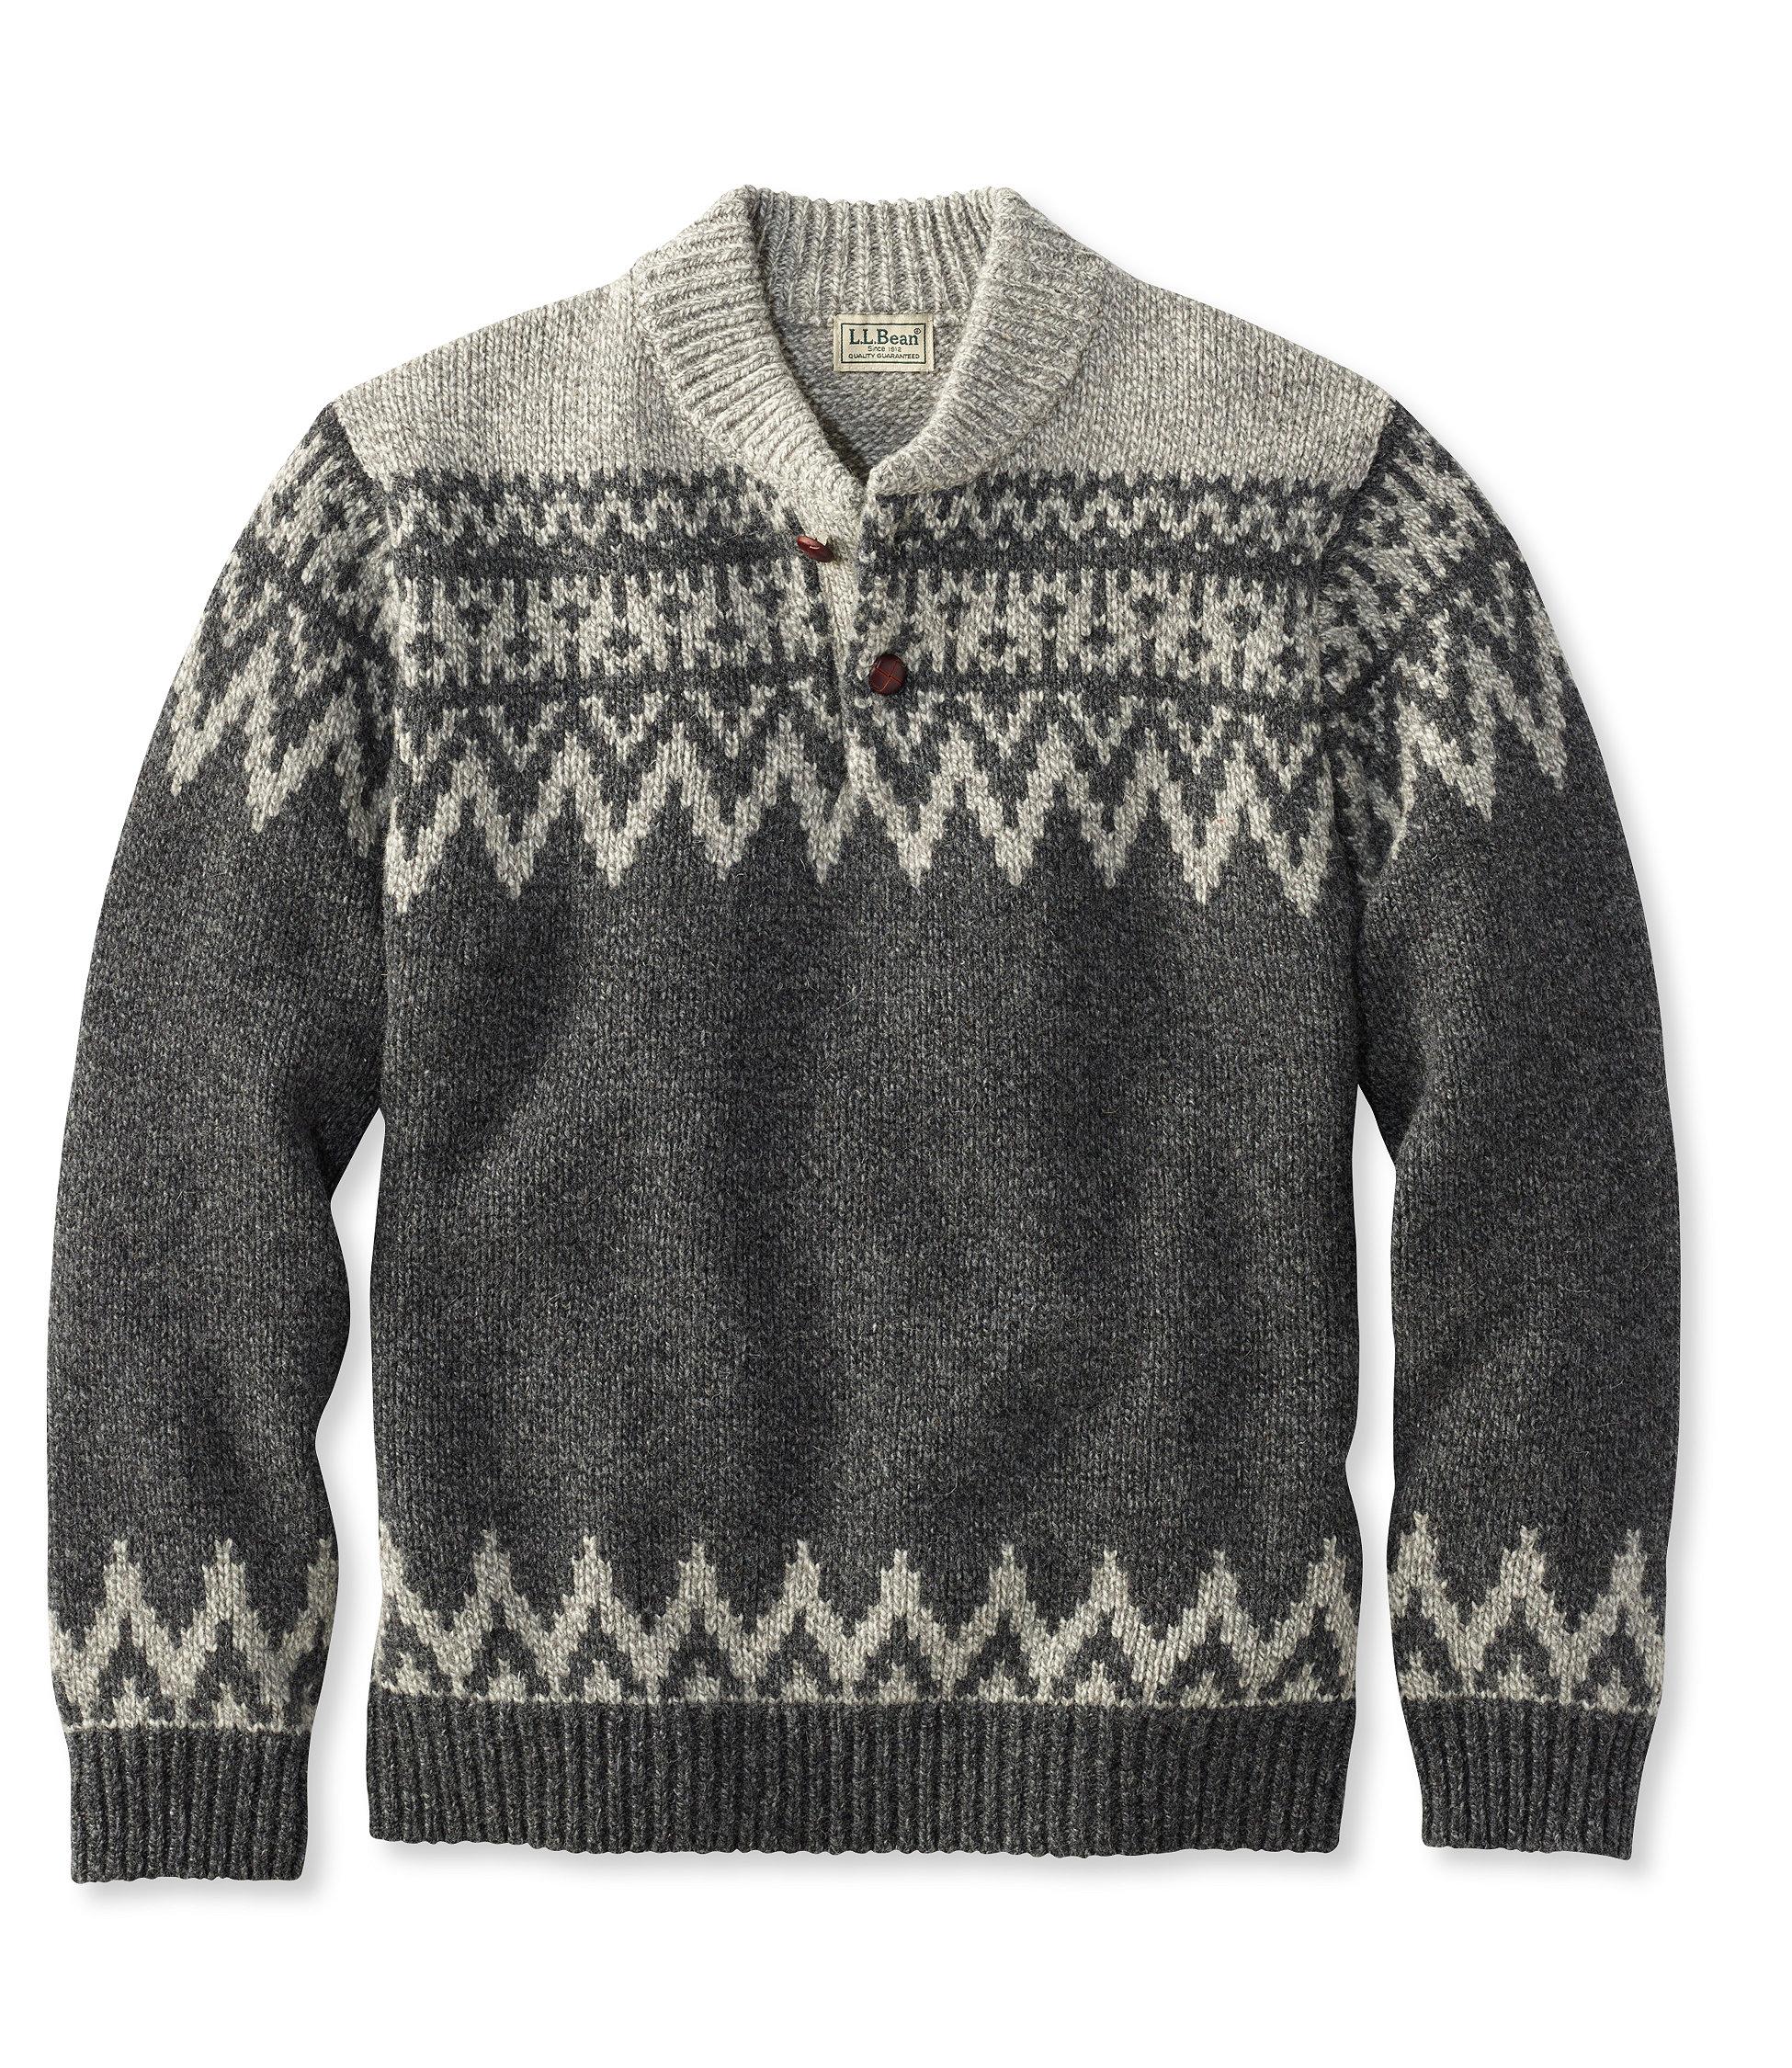 L.L.Bean Classic Ragg Wool Henley Sweater